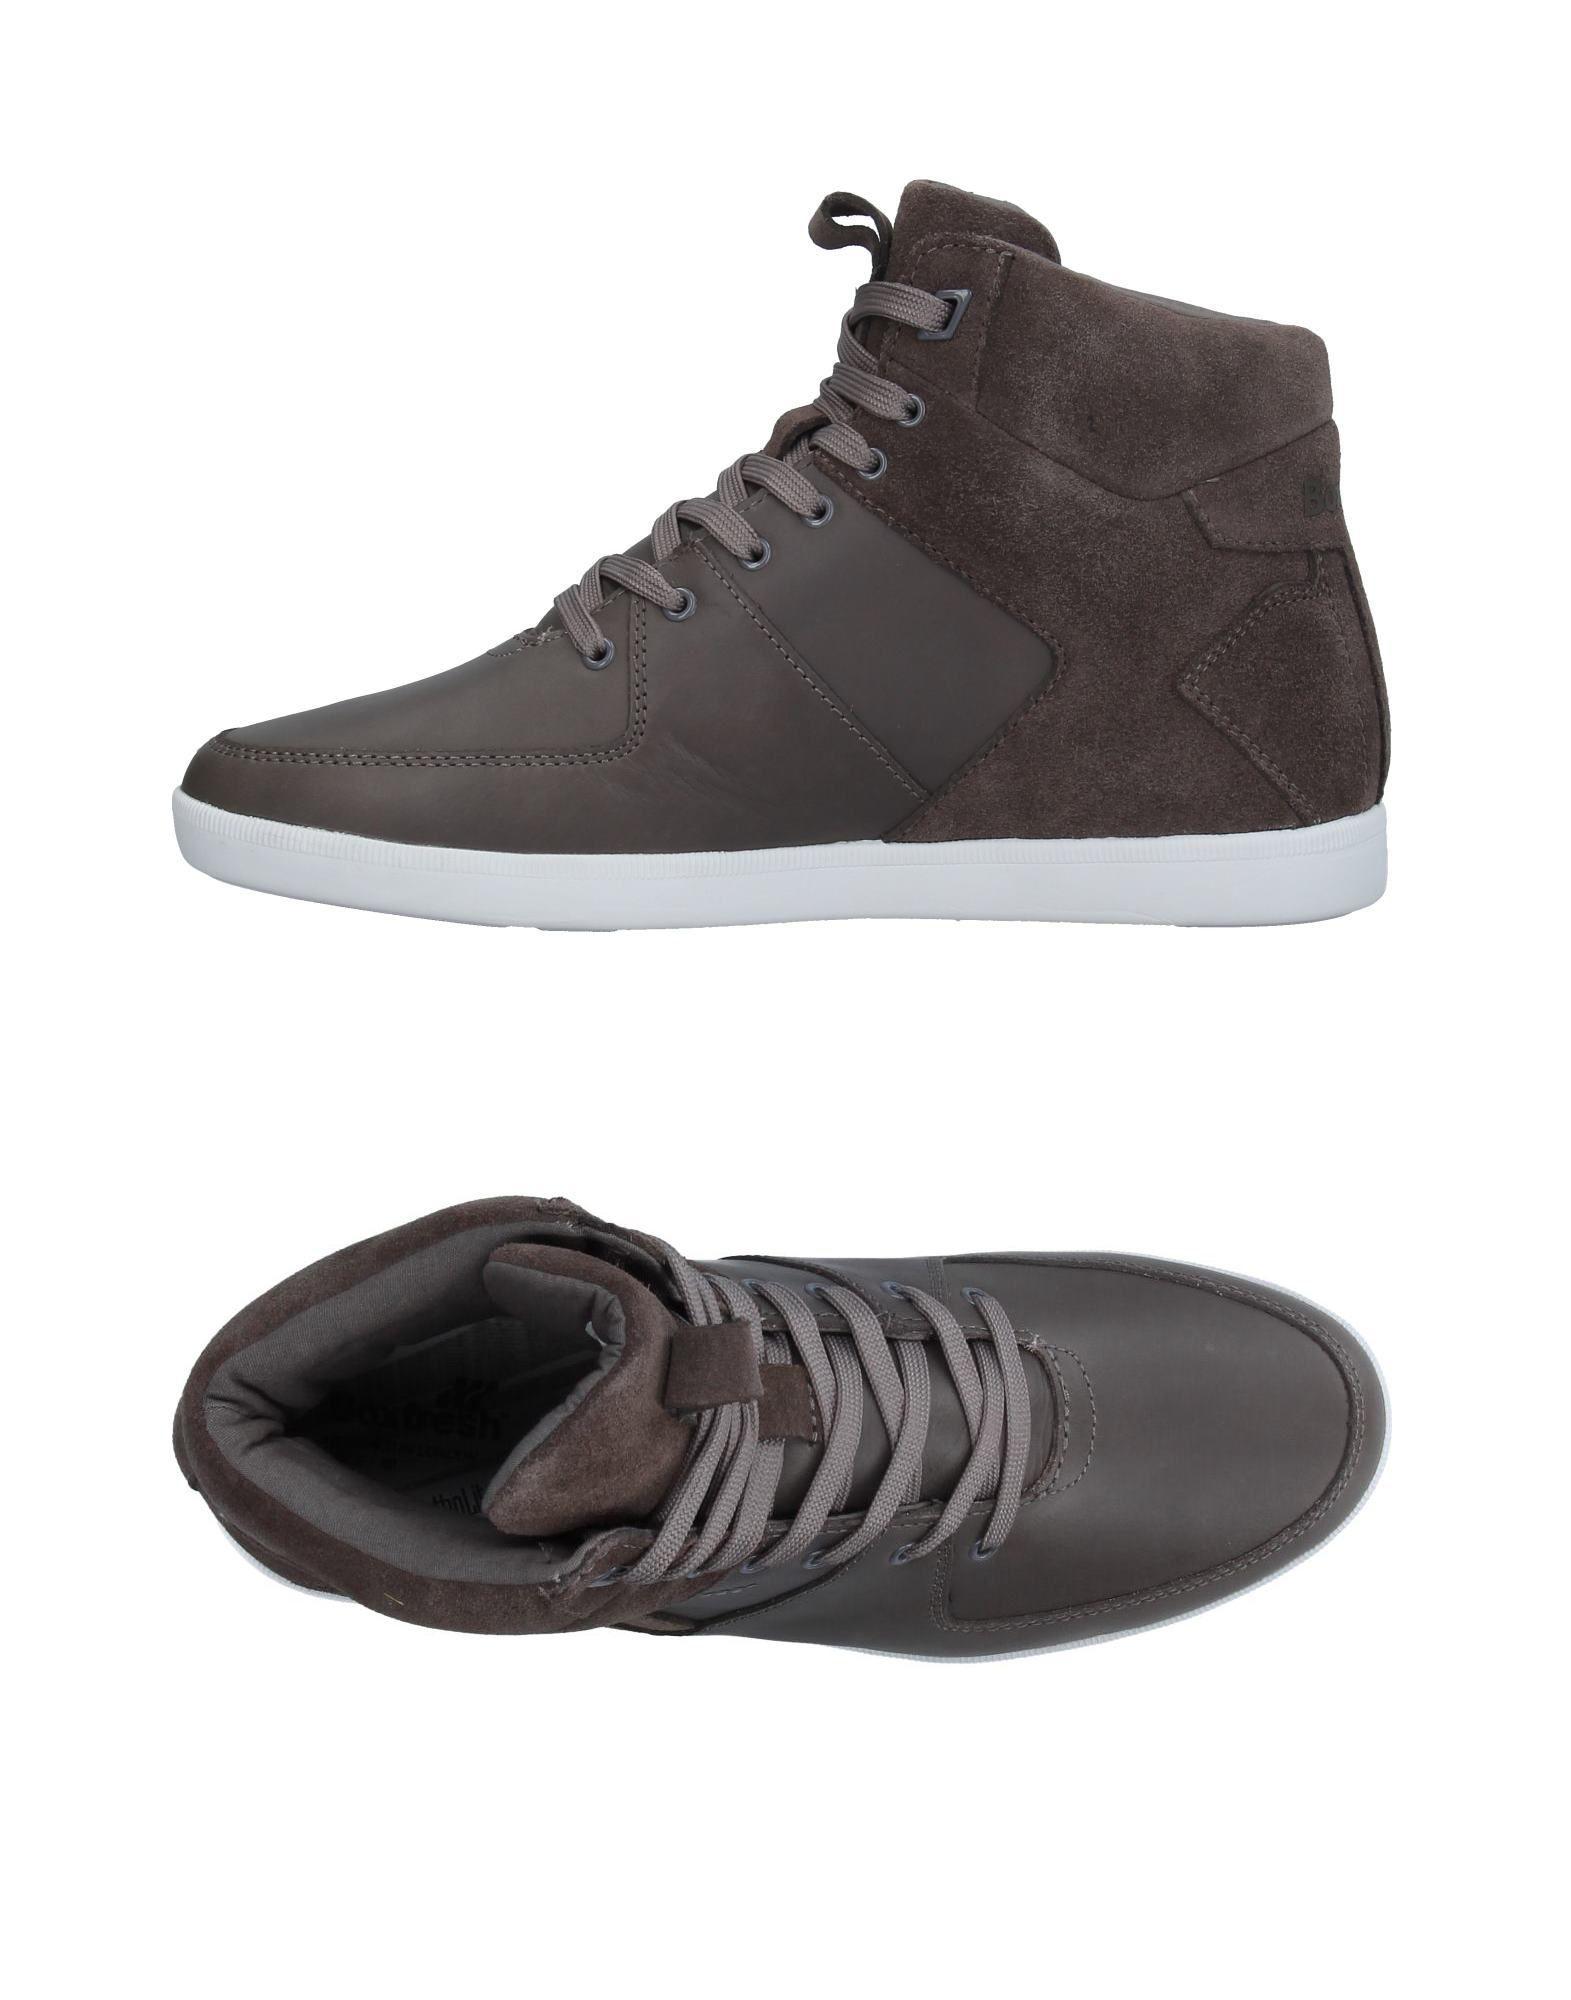 Rabatt echte Schuhe 11275936UX Boxfresh Sneakers Herren  11275936UX Schuhe caaa0a